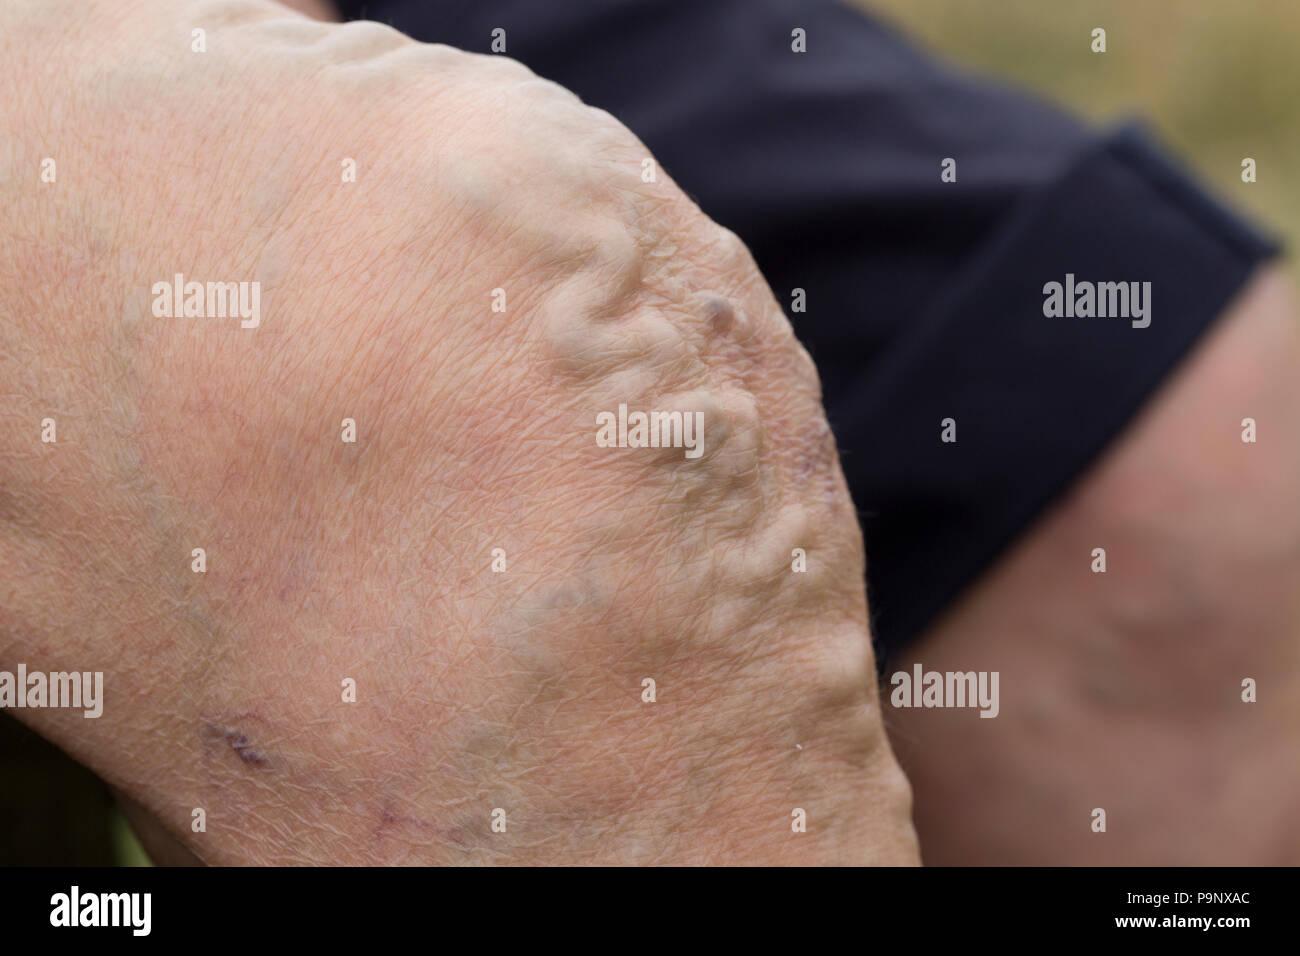 Enlarged varicose veins on knee of senior woman UK - Stock Image